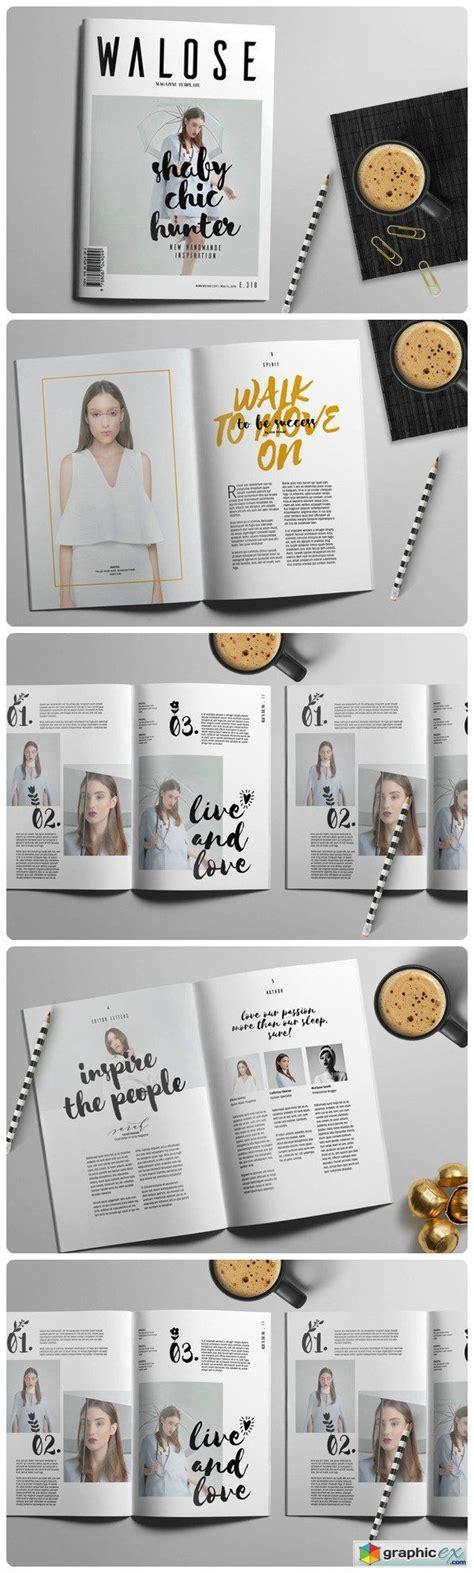 magazine layout my designs pinterest 1 quot layout and best 20 magazine layouts ideas on pinterest